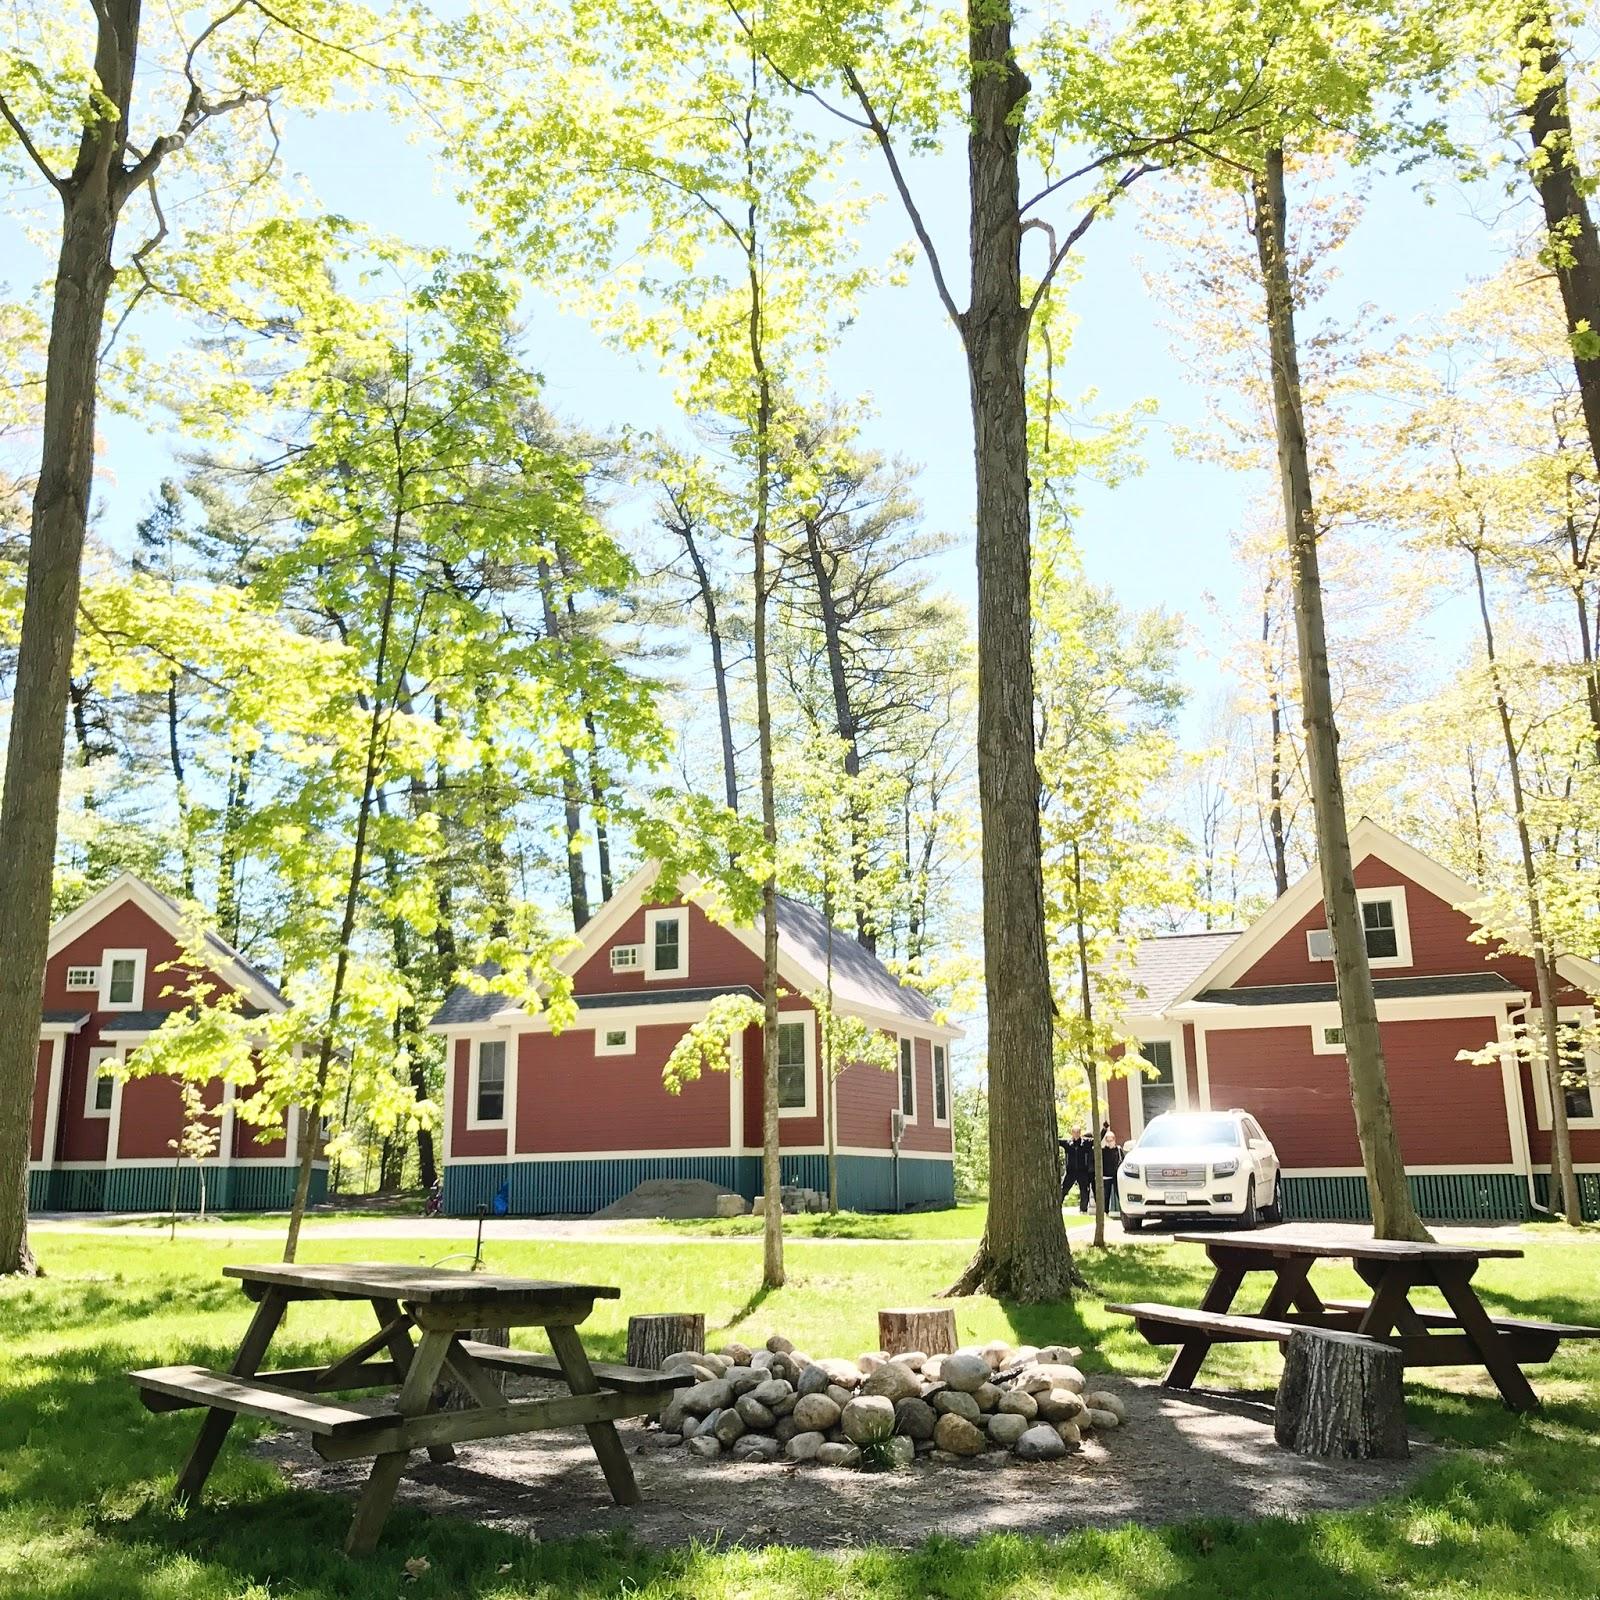 sandbanks summer village, prince edward county attractions, flower stand, belleville attractions, trenton